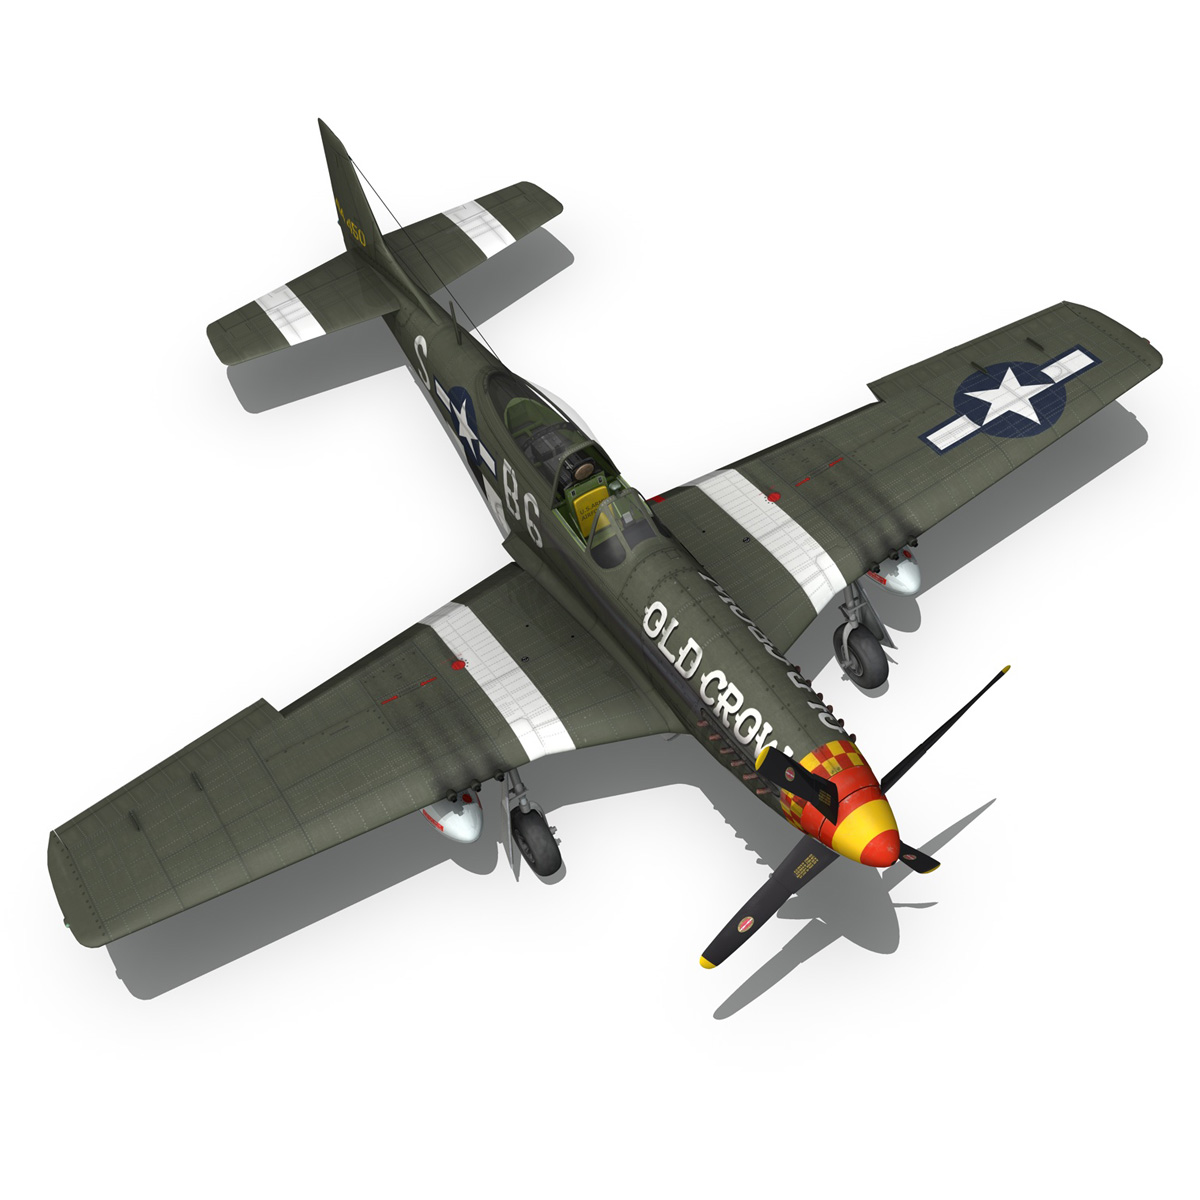 north american p-51d mustang – old crow 3d model fbx c4d lwo obj 273347